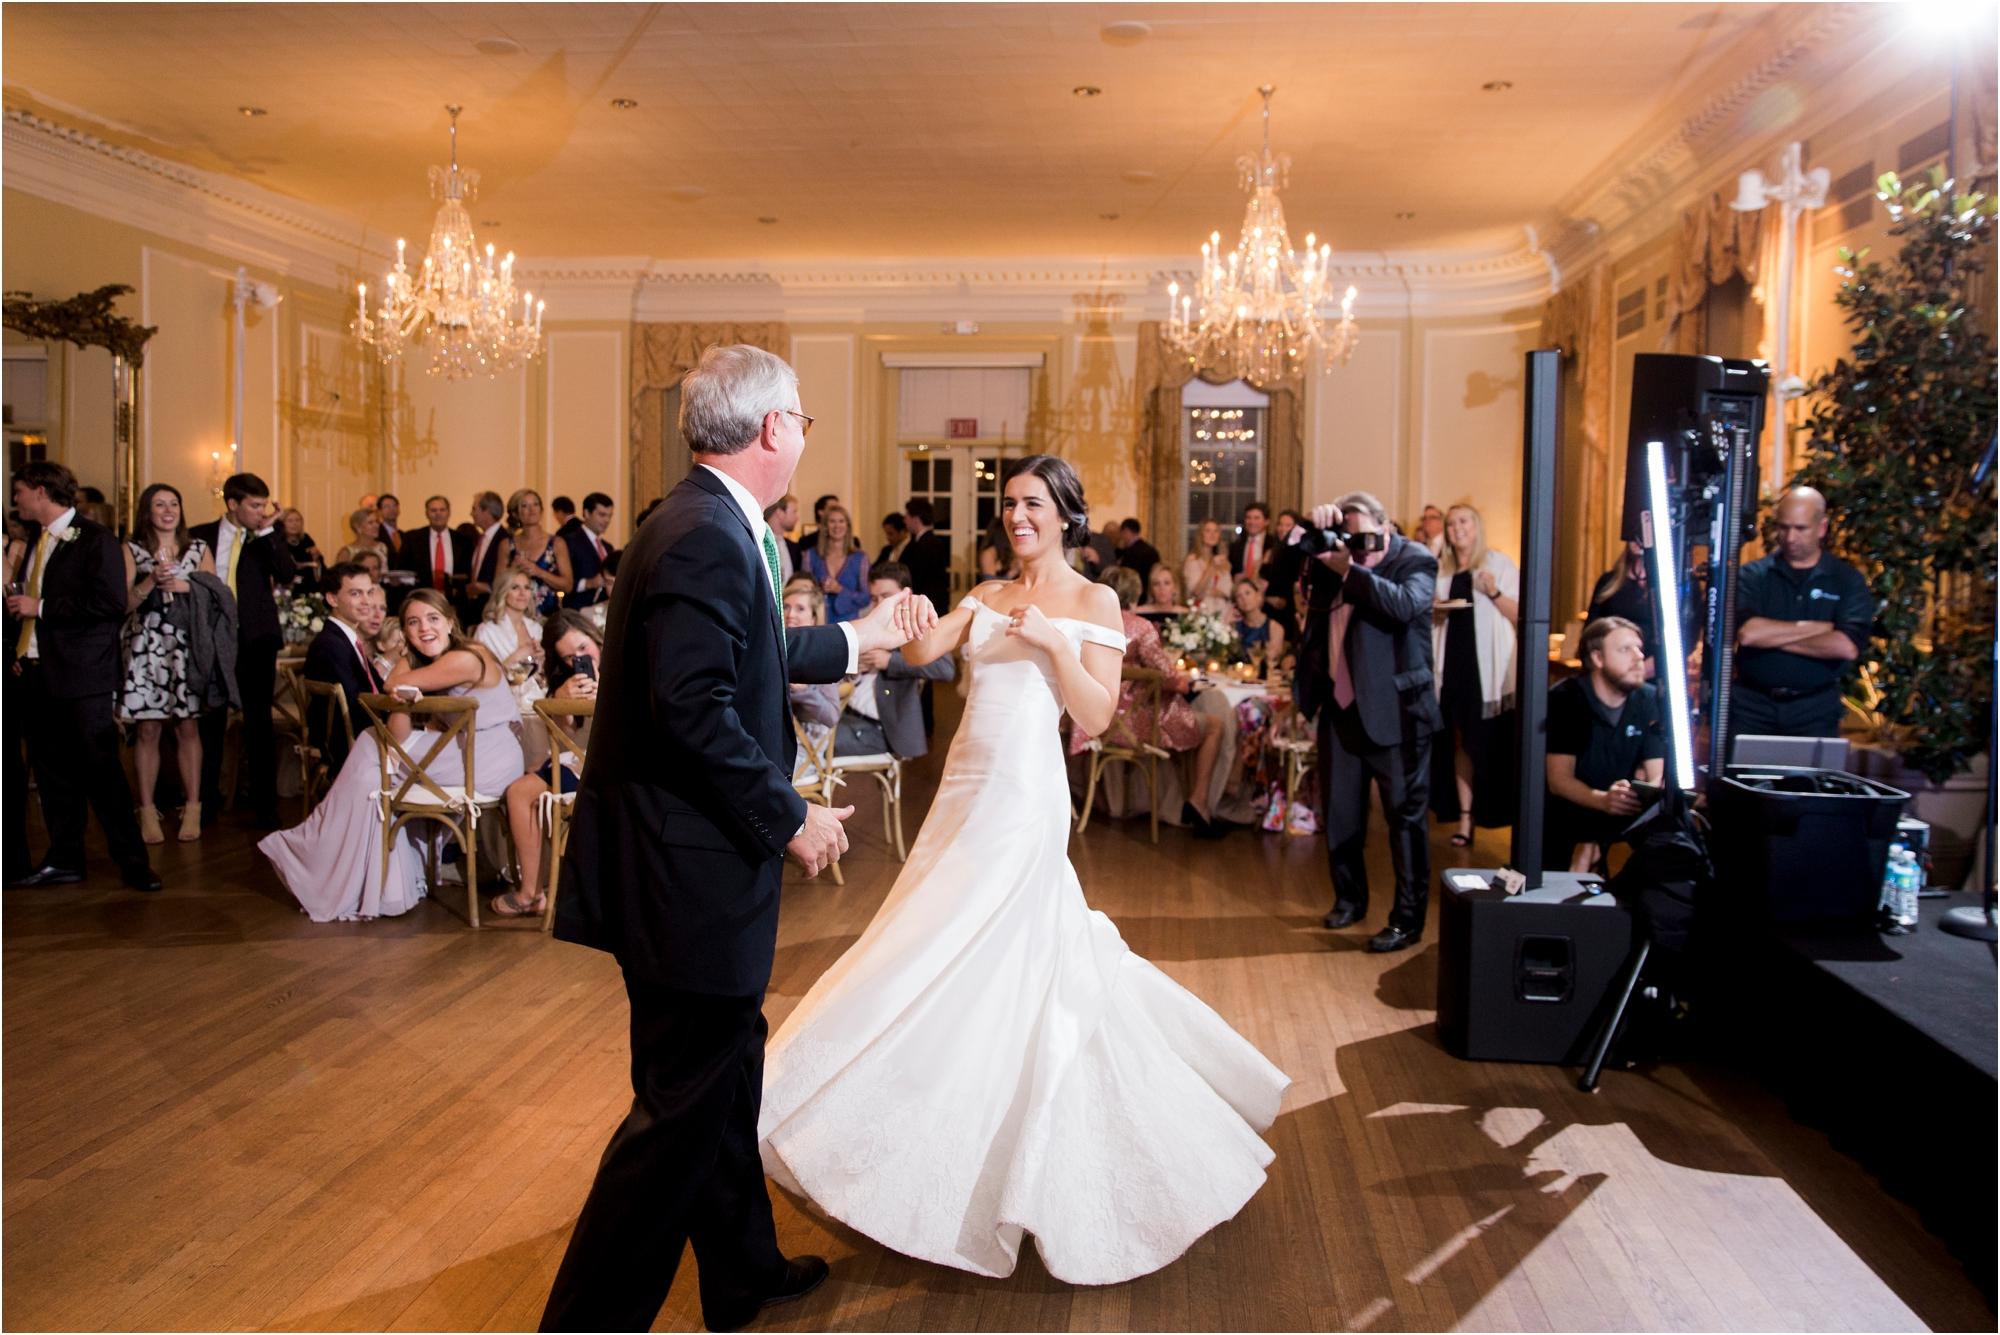 claire-thomas-farmington-country-club-charlottesville-virginia-wedding-photos_0042.jpg